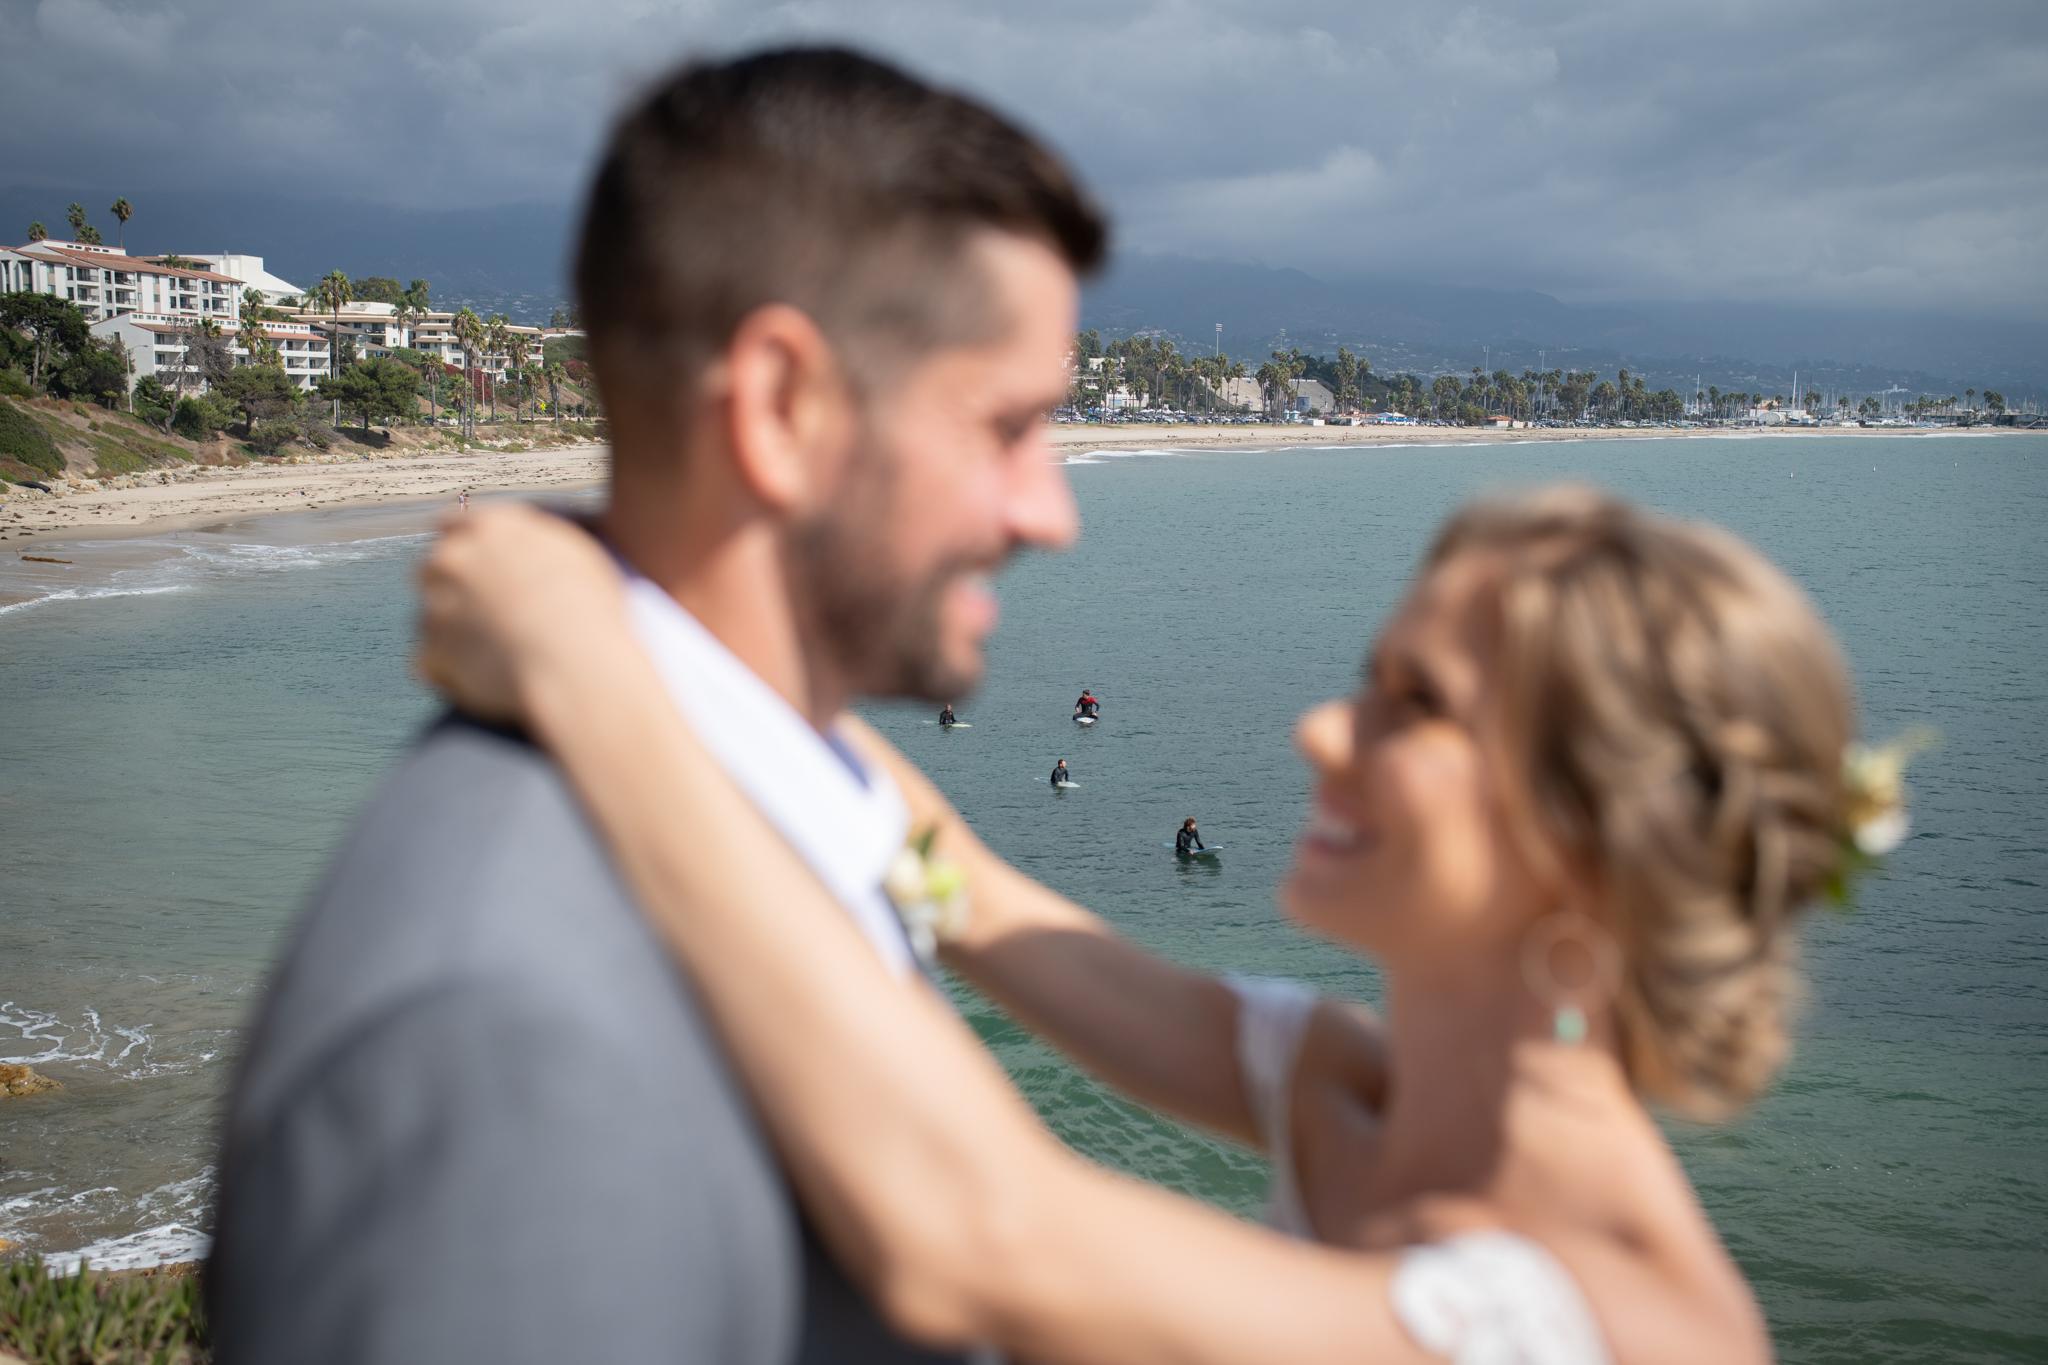 17_PRVW_Jenny_Ken_Wedding_Trevor_Hooper_Photo.jpg